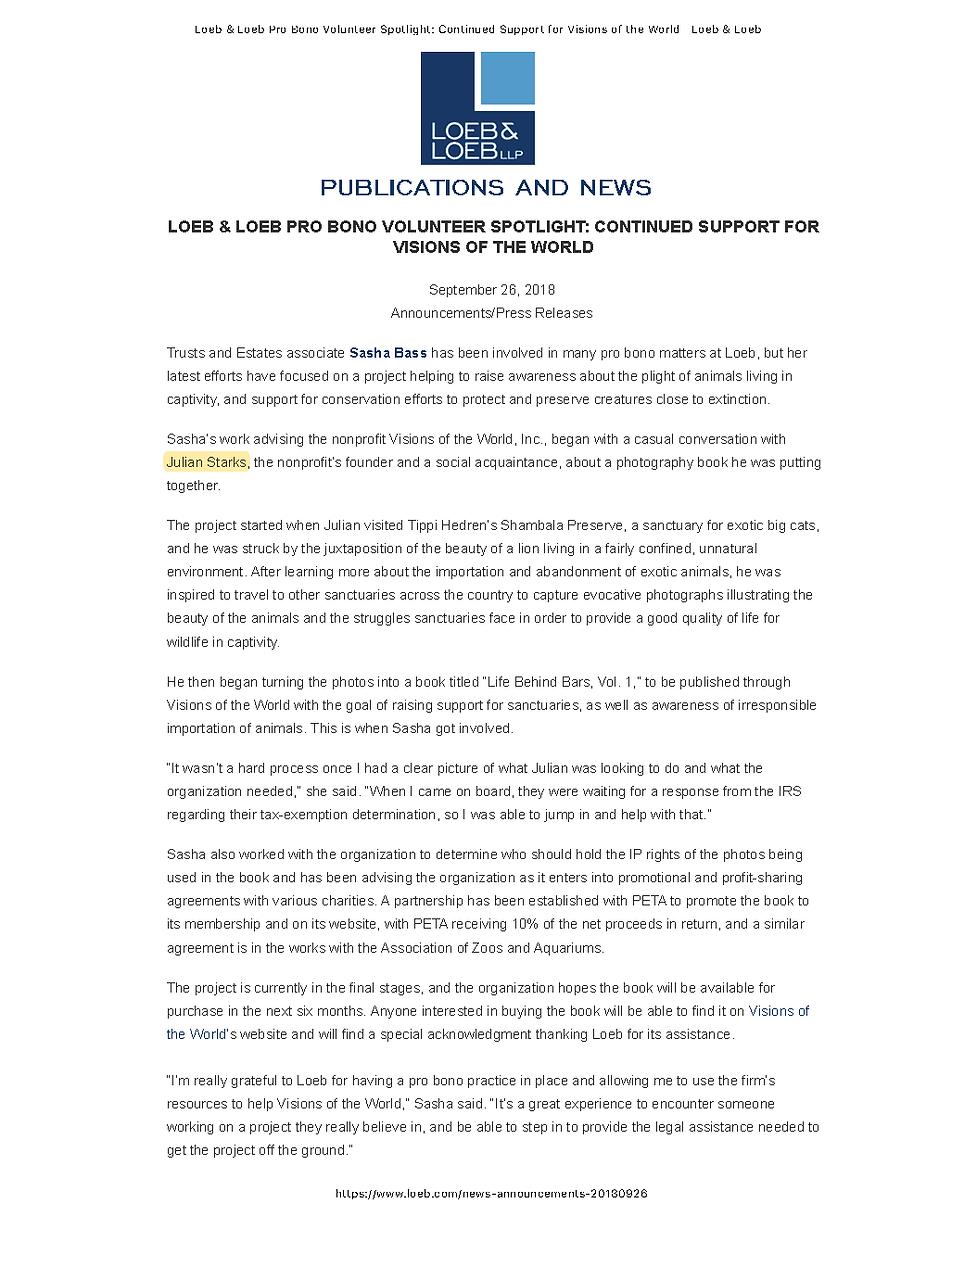 Loeb & Loeb Pro Bono Support for Visions